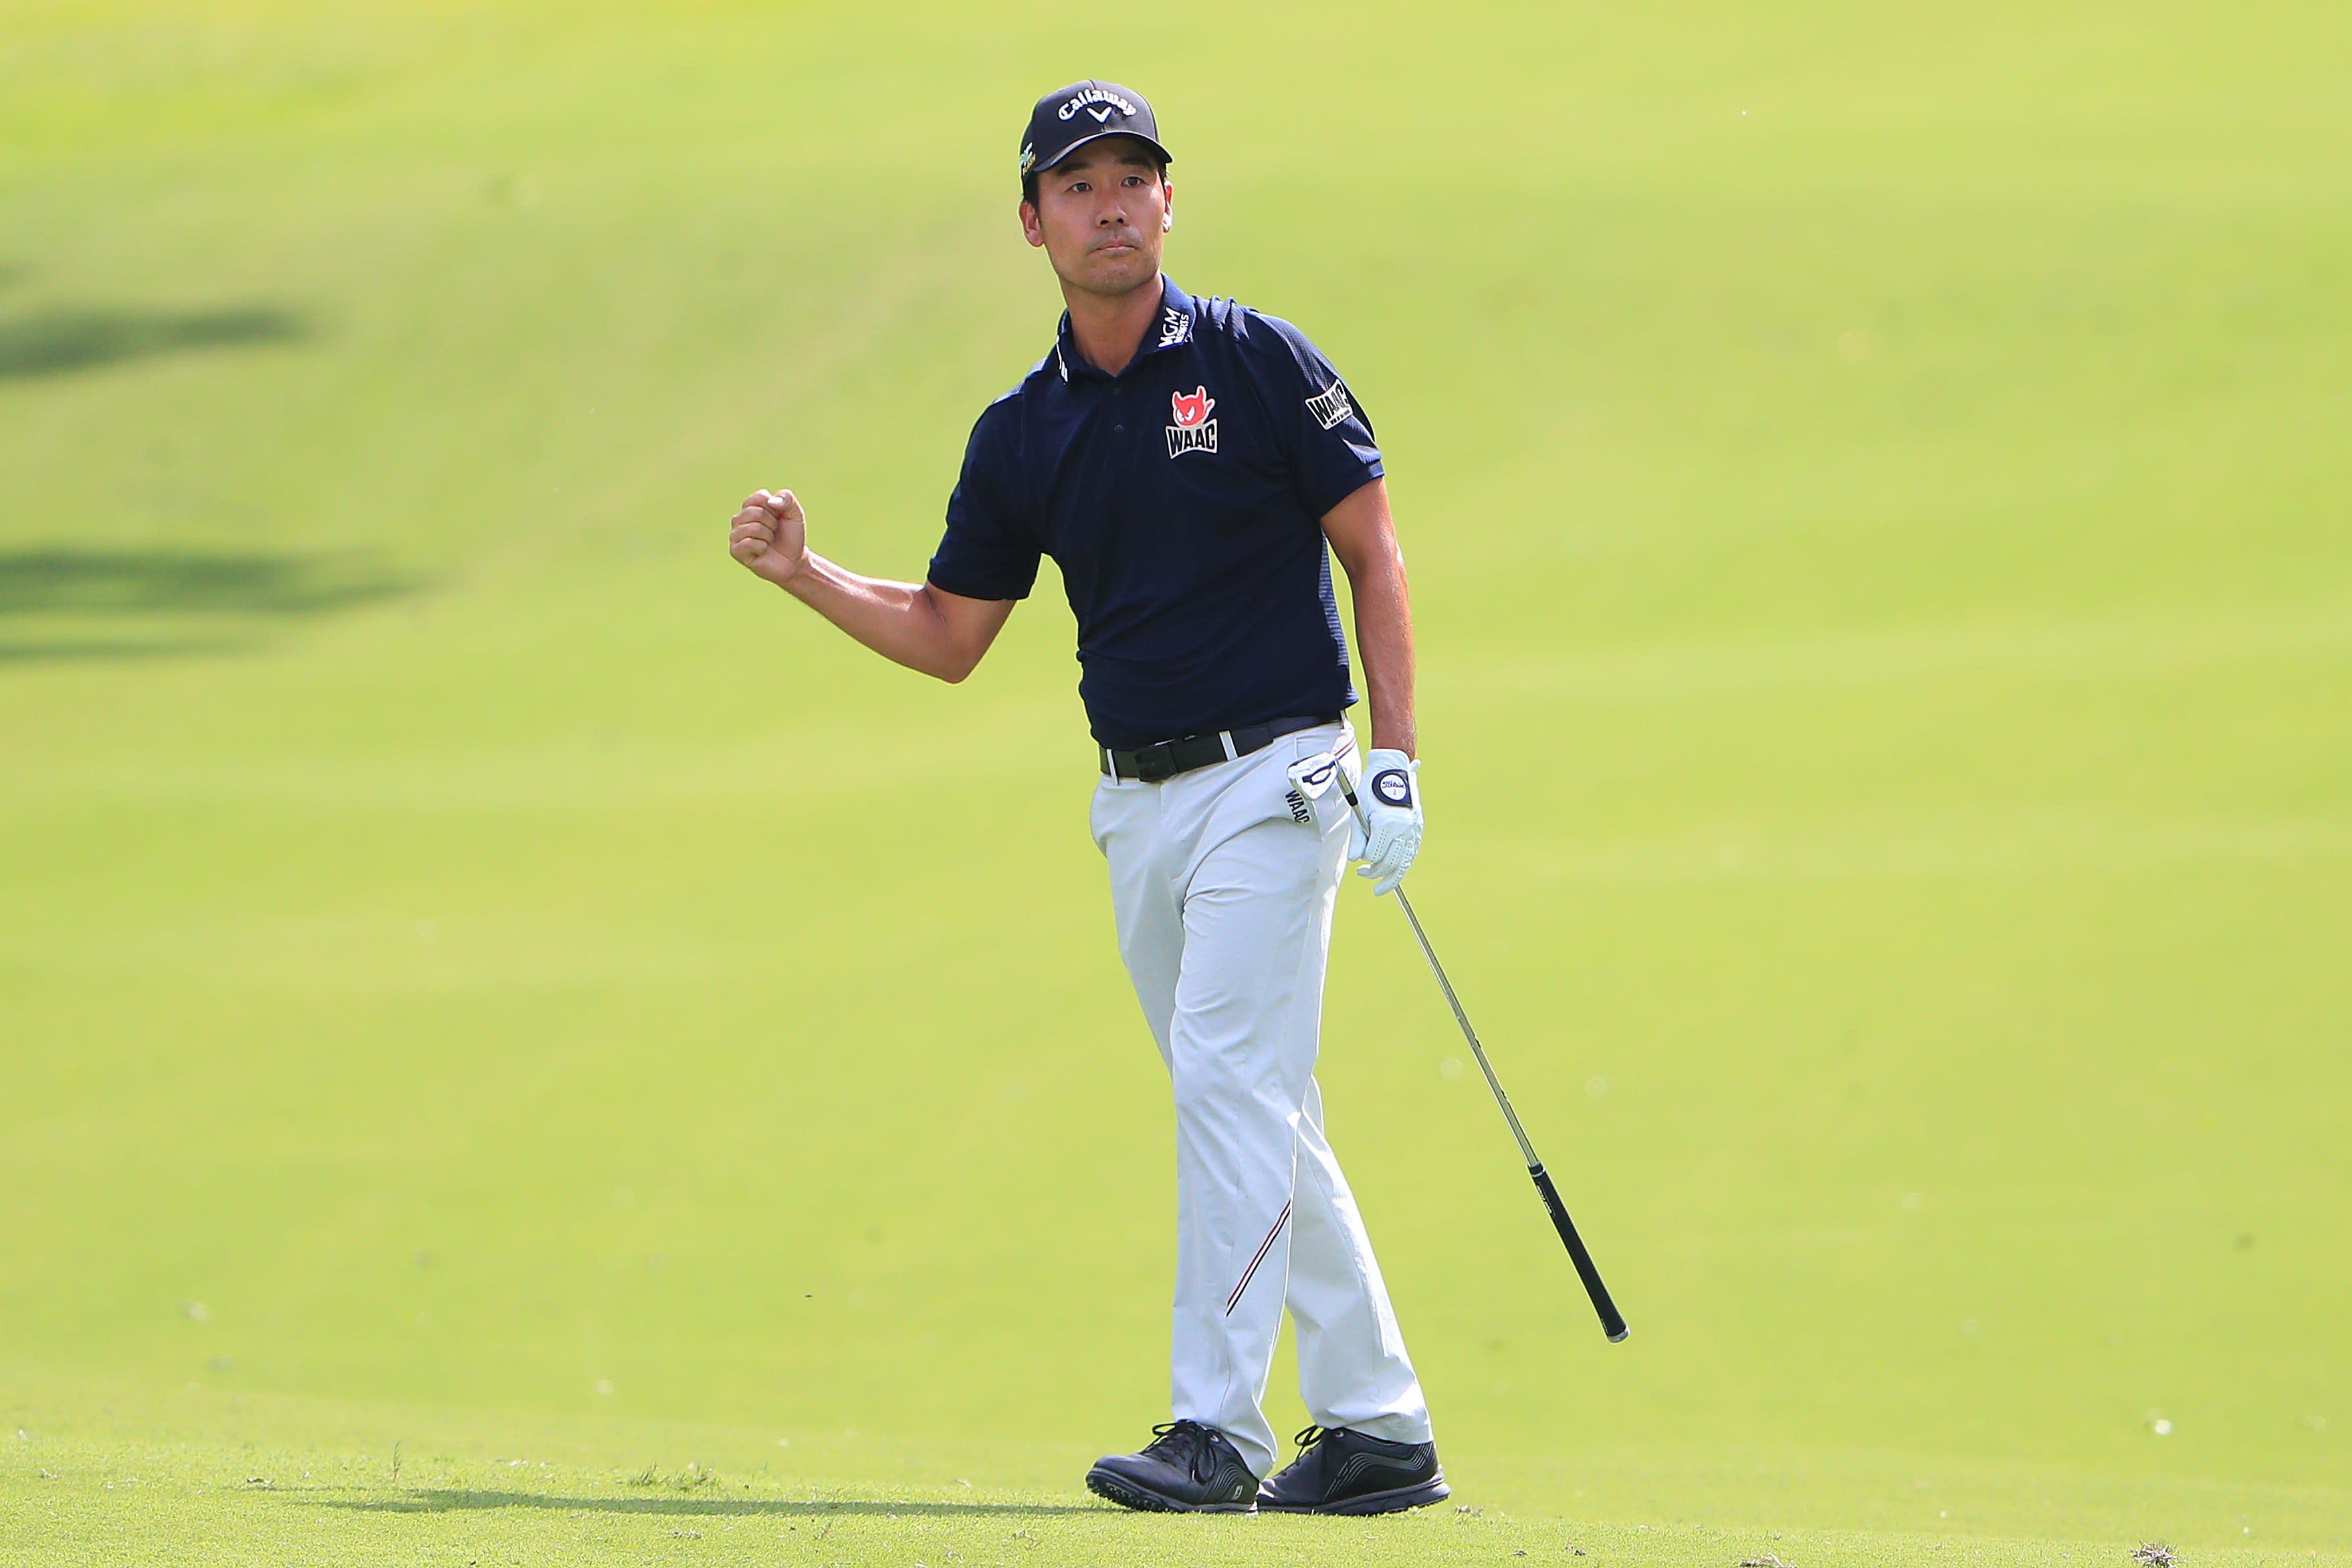 Winning looks on the PGA Tour: Brooks Koepka at the WGC